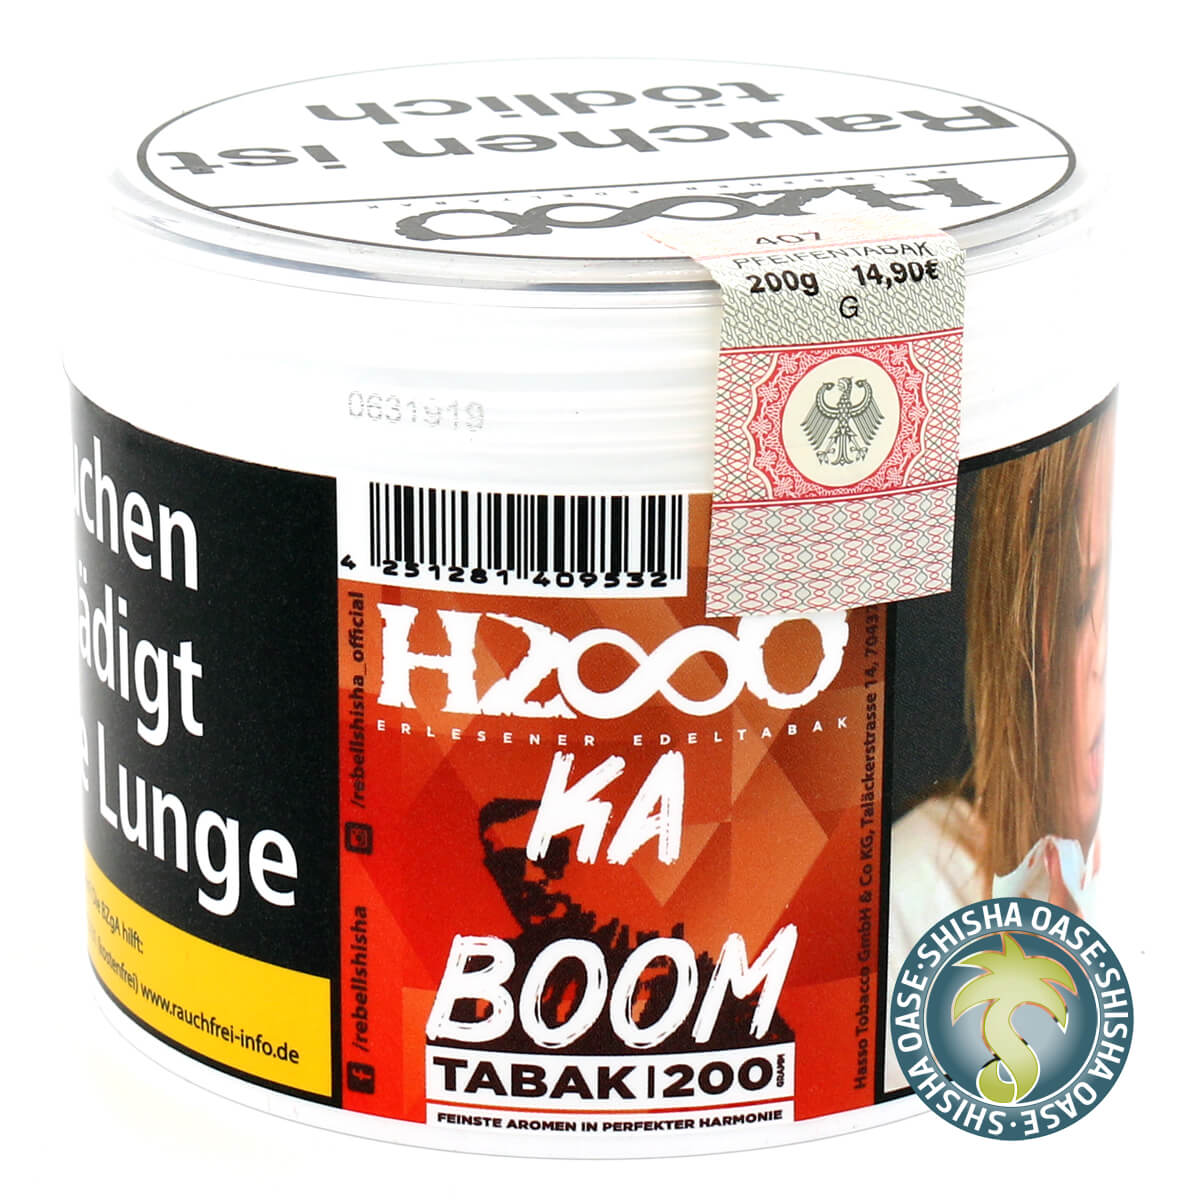 Hasso Tabak - Classic Line 200g - Ka Boom